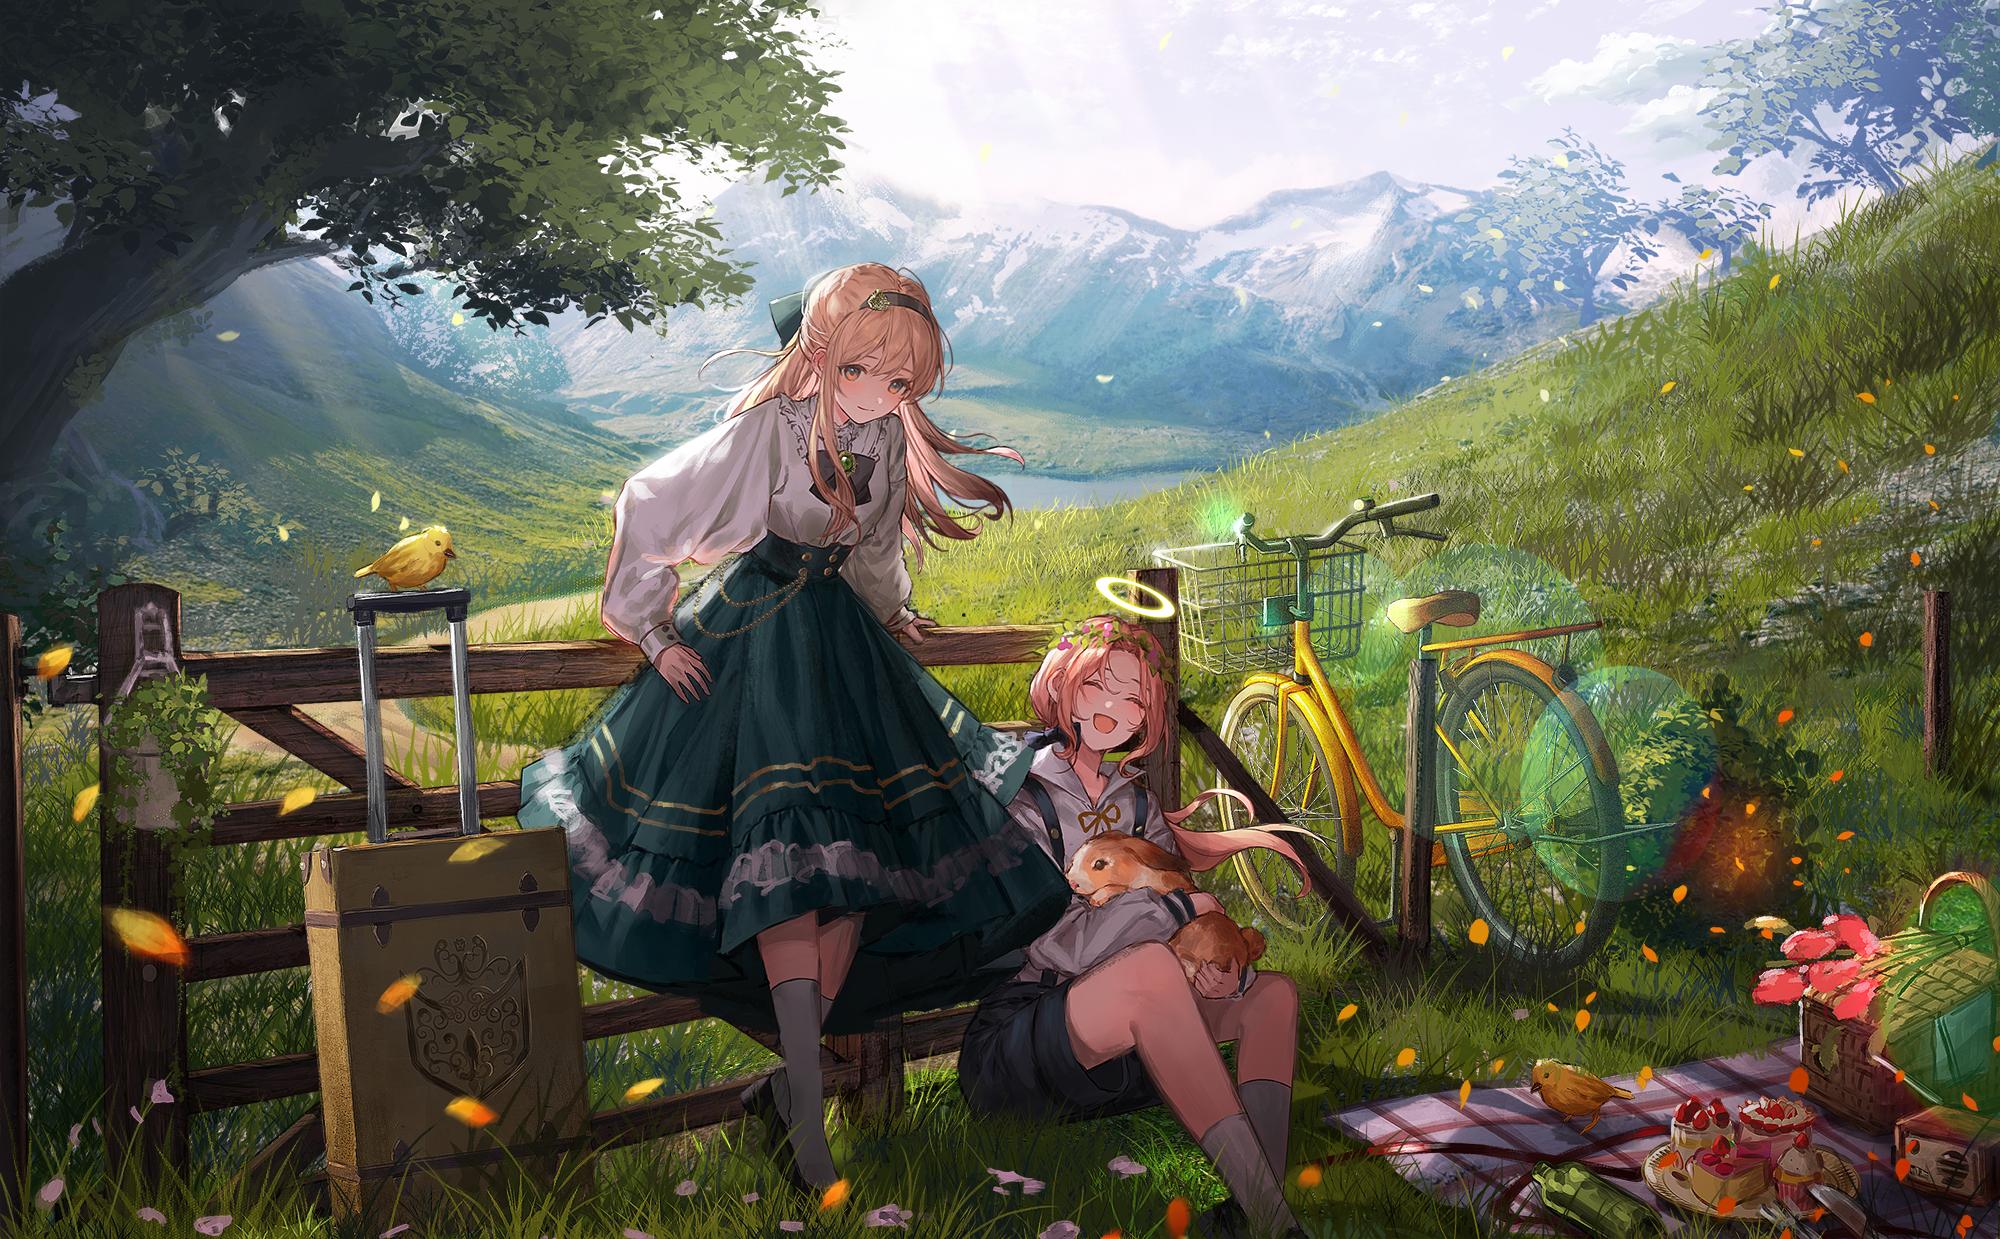 Anime 2000x1239 blonde Lentain artwork anime girls nimbus pink hair landscape angel halo